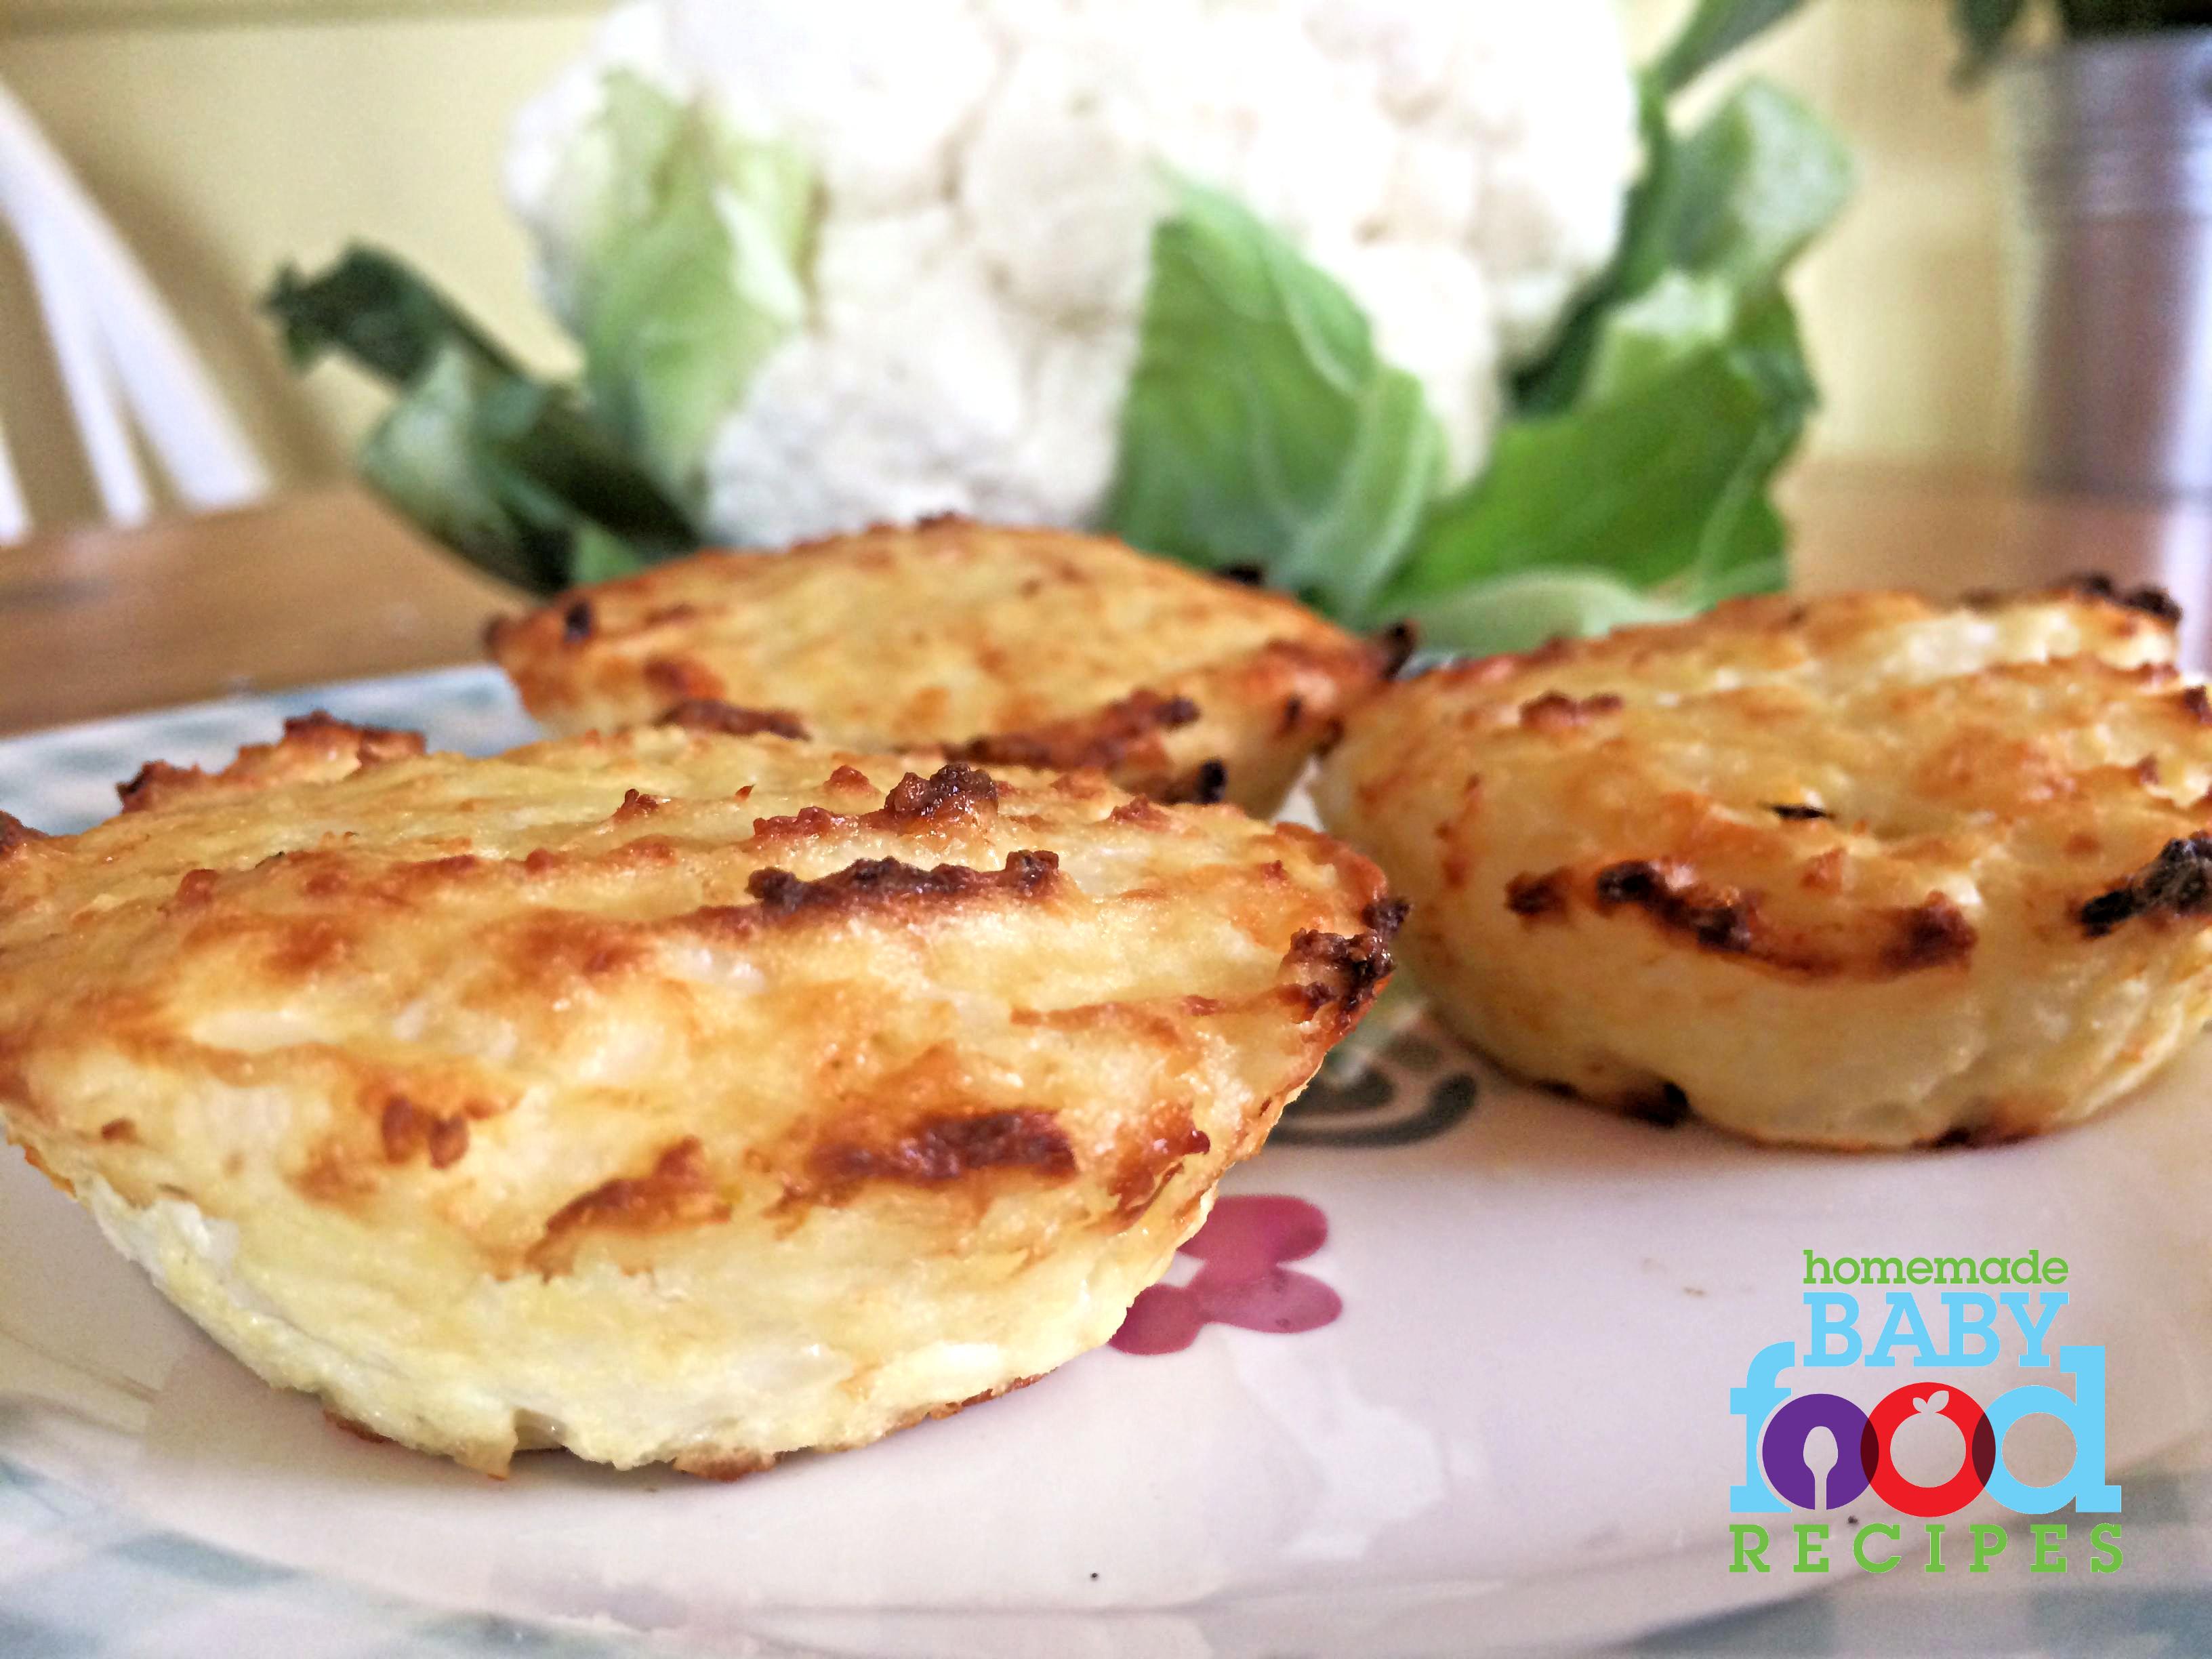 Baby's cauliflower muffins